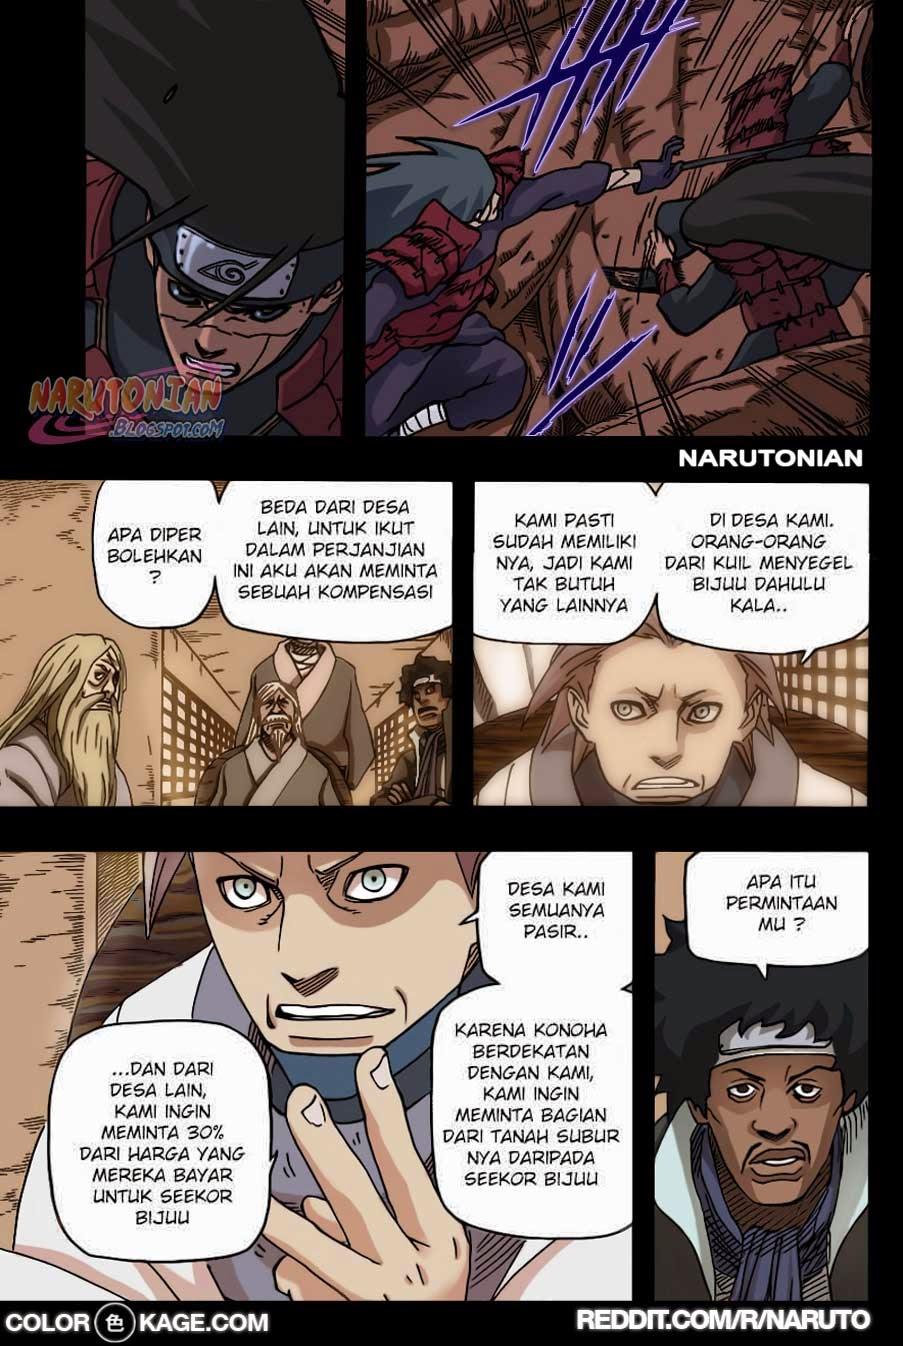 Dilarang COPAS - situs resmi www.mangacanblog.com - Komik naruto berwarna 648 - impian seorang shinobi 649 Indonesia naruto berwarna 648 - impian seorang shinobi Terbaru 11|Baca Manga Komik Indonesia|Mangacan